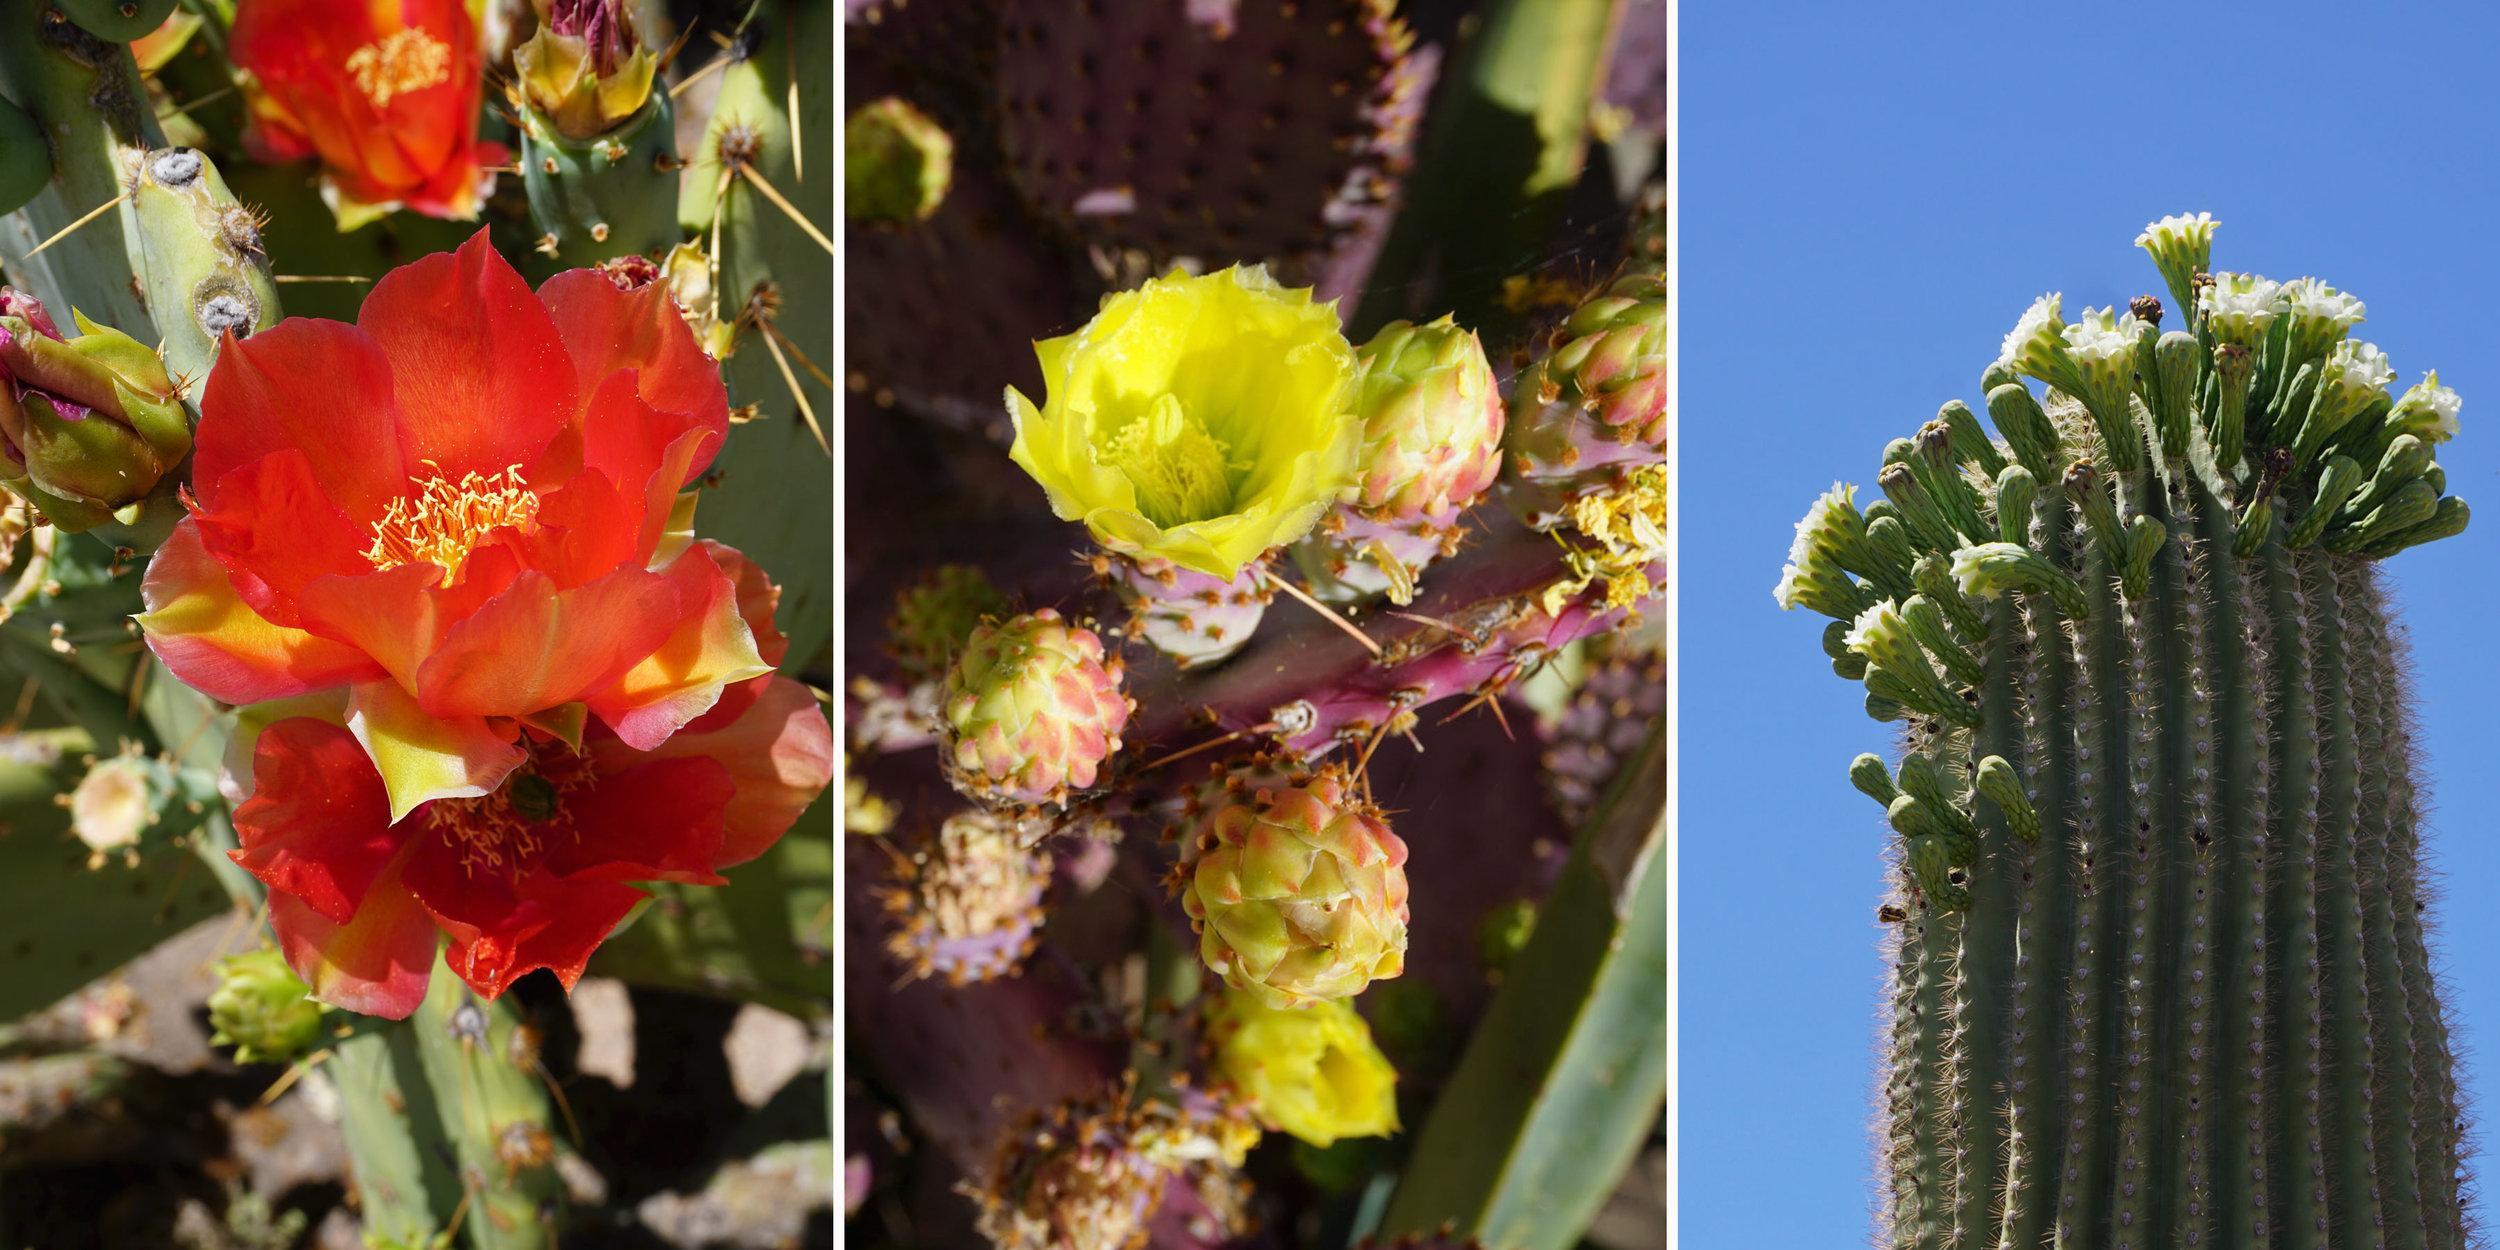 © 2019 Louise Levergneux. Different cacti in Casa Grande, Arizona. /  Différents cactus à Casa Grande, Arizona.